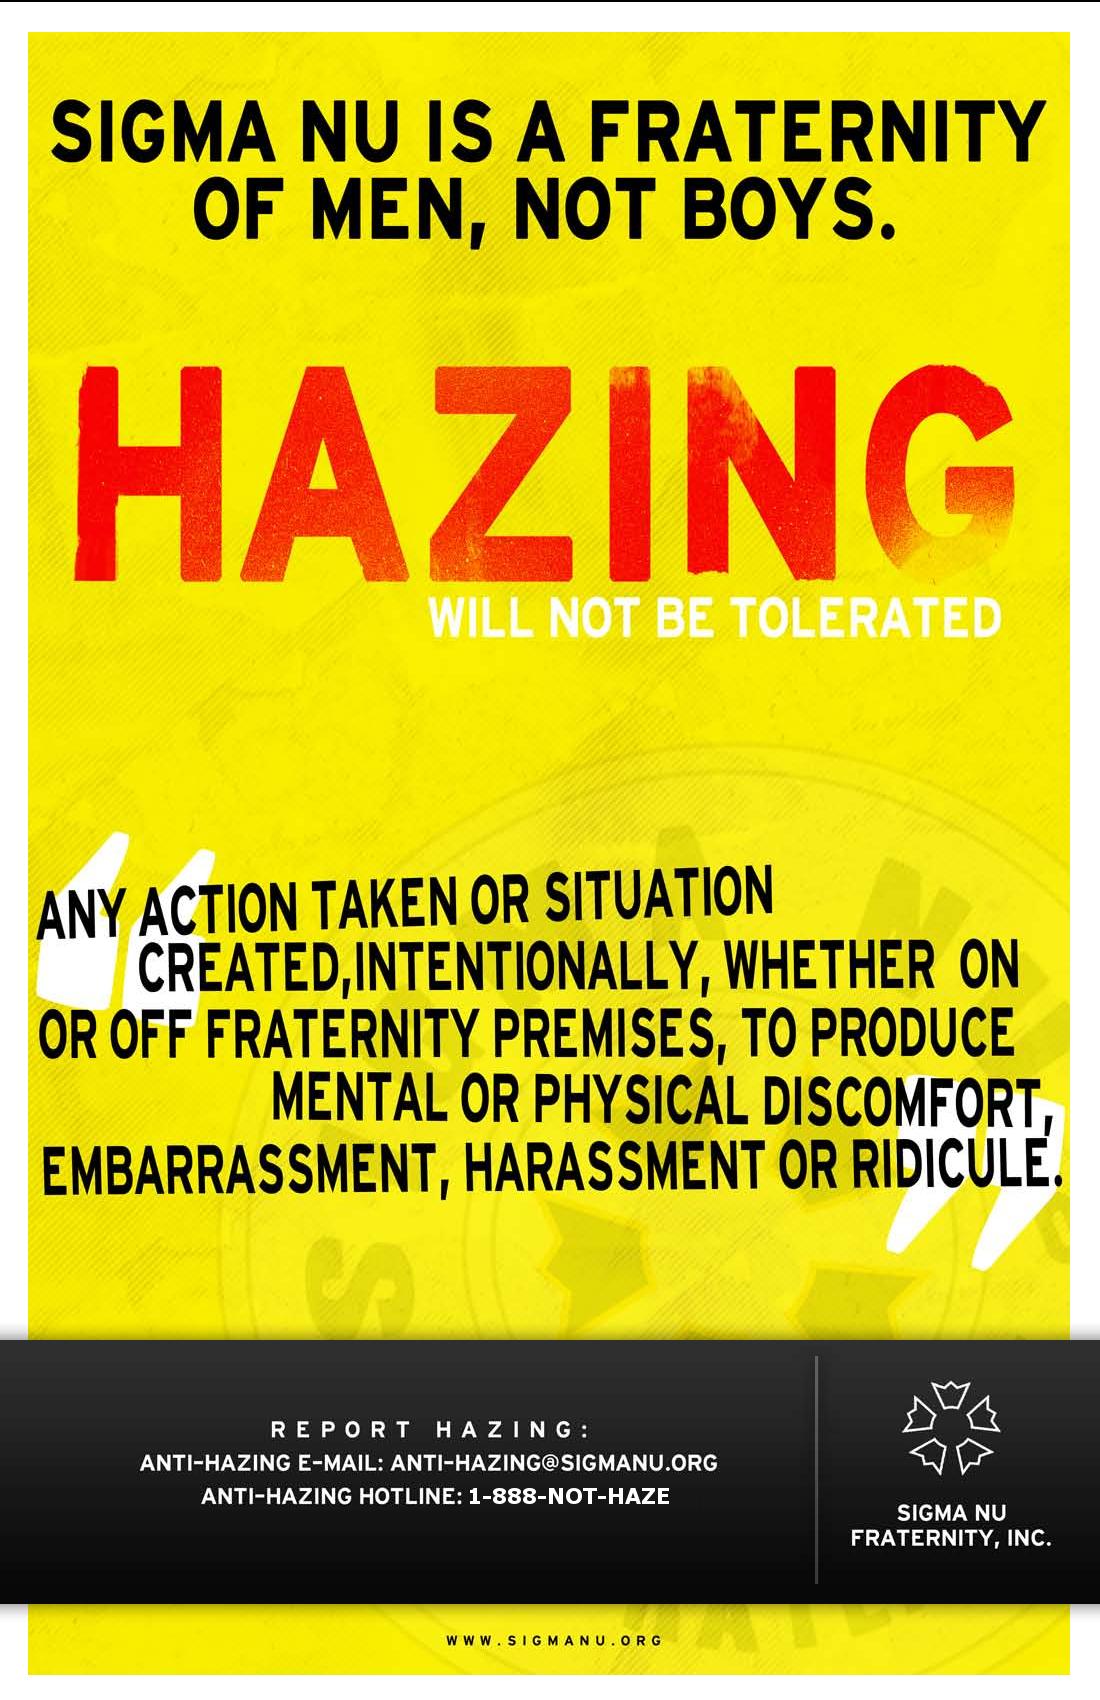 Anti-Hazing Poster